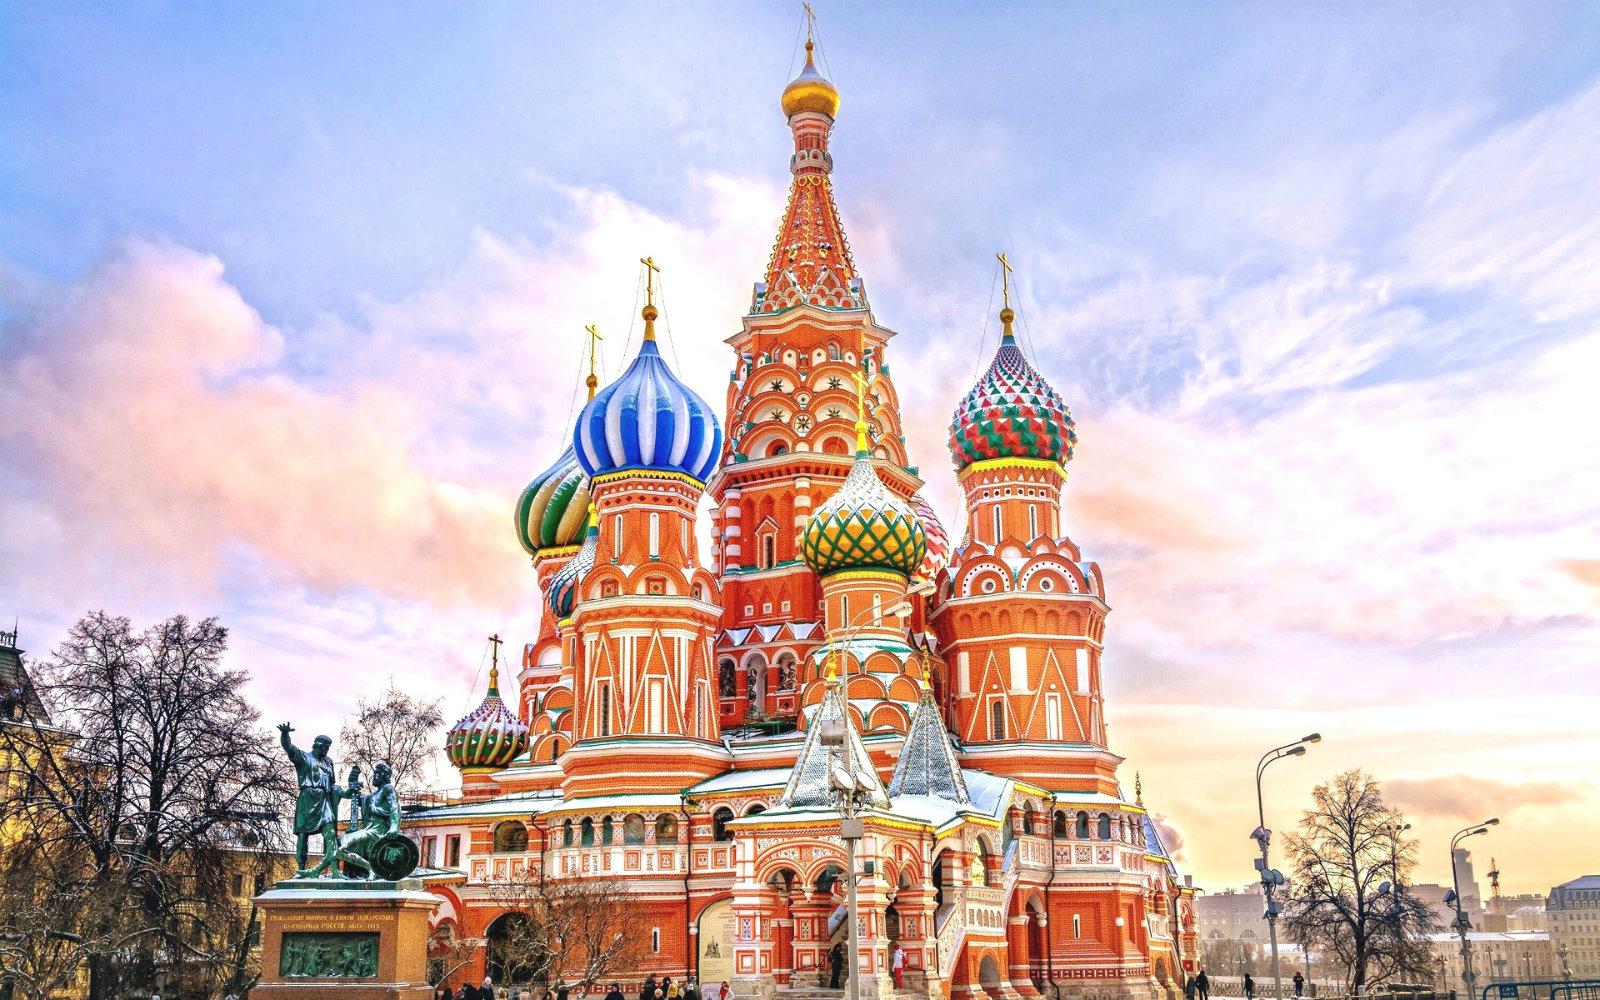 Gran tour mosca e san pietroburgo mosca russia dlt viaggi - Architektonische meisterwerke ...